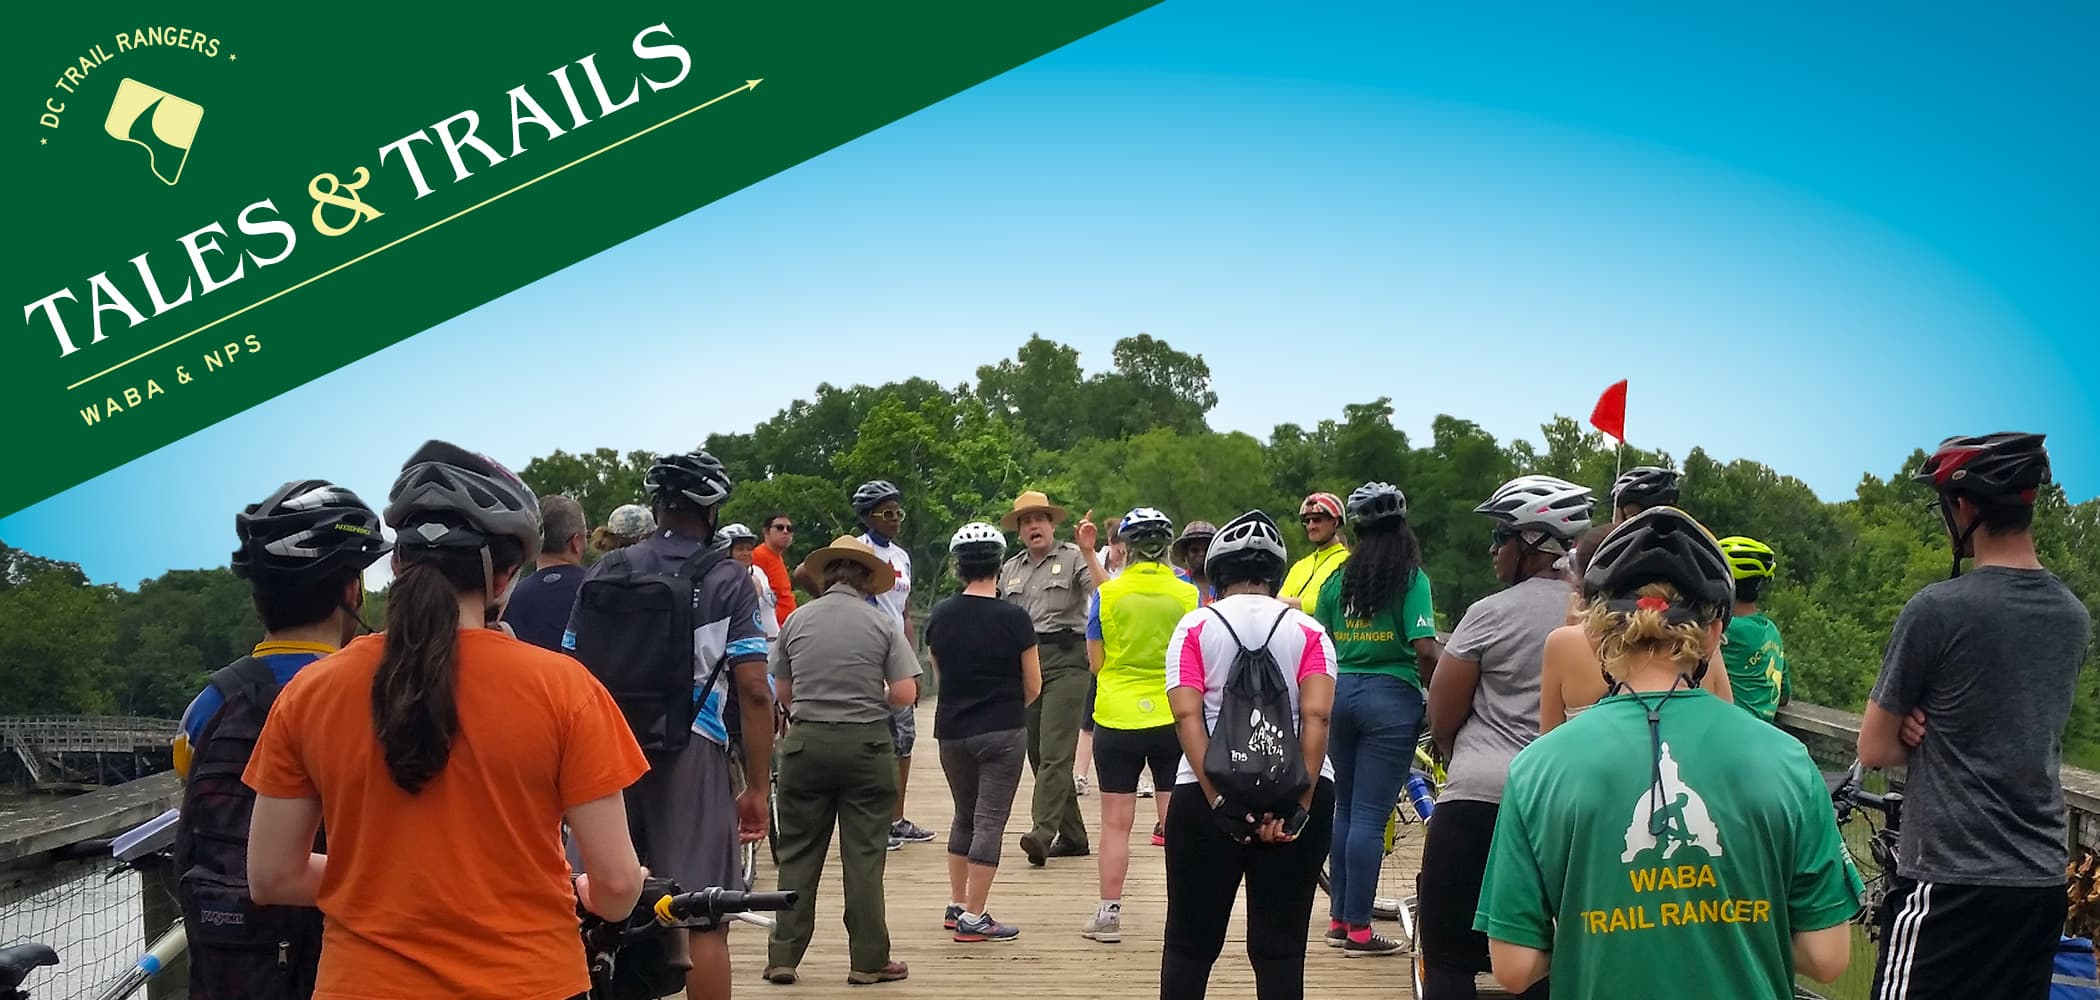 guided trail rides washington state